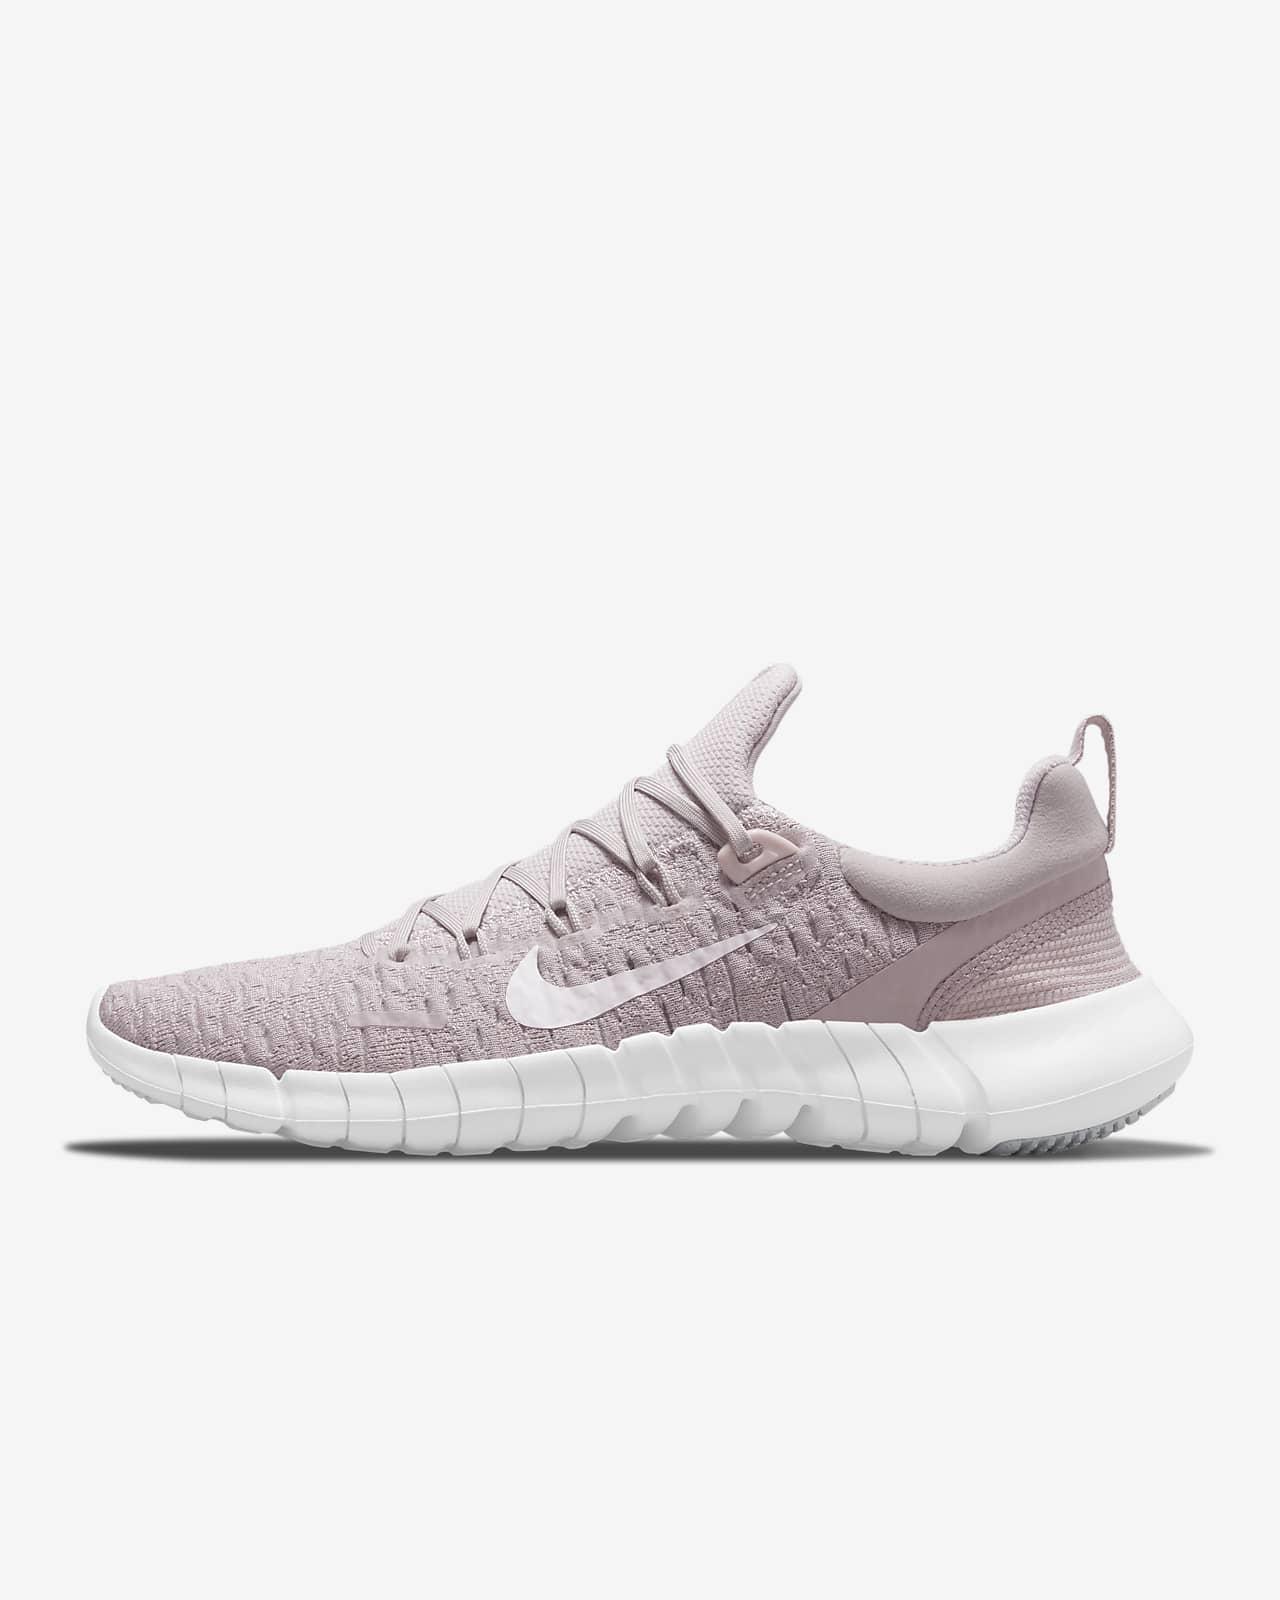 Nike Free RN 5.0 Next Nature 女子跑步鞋